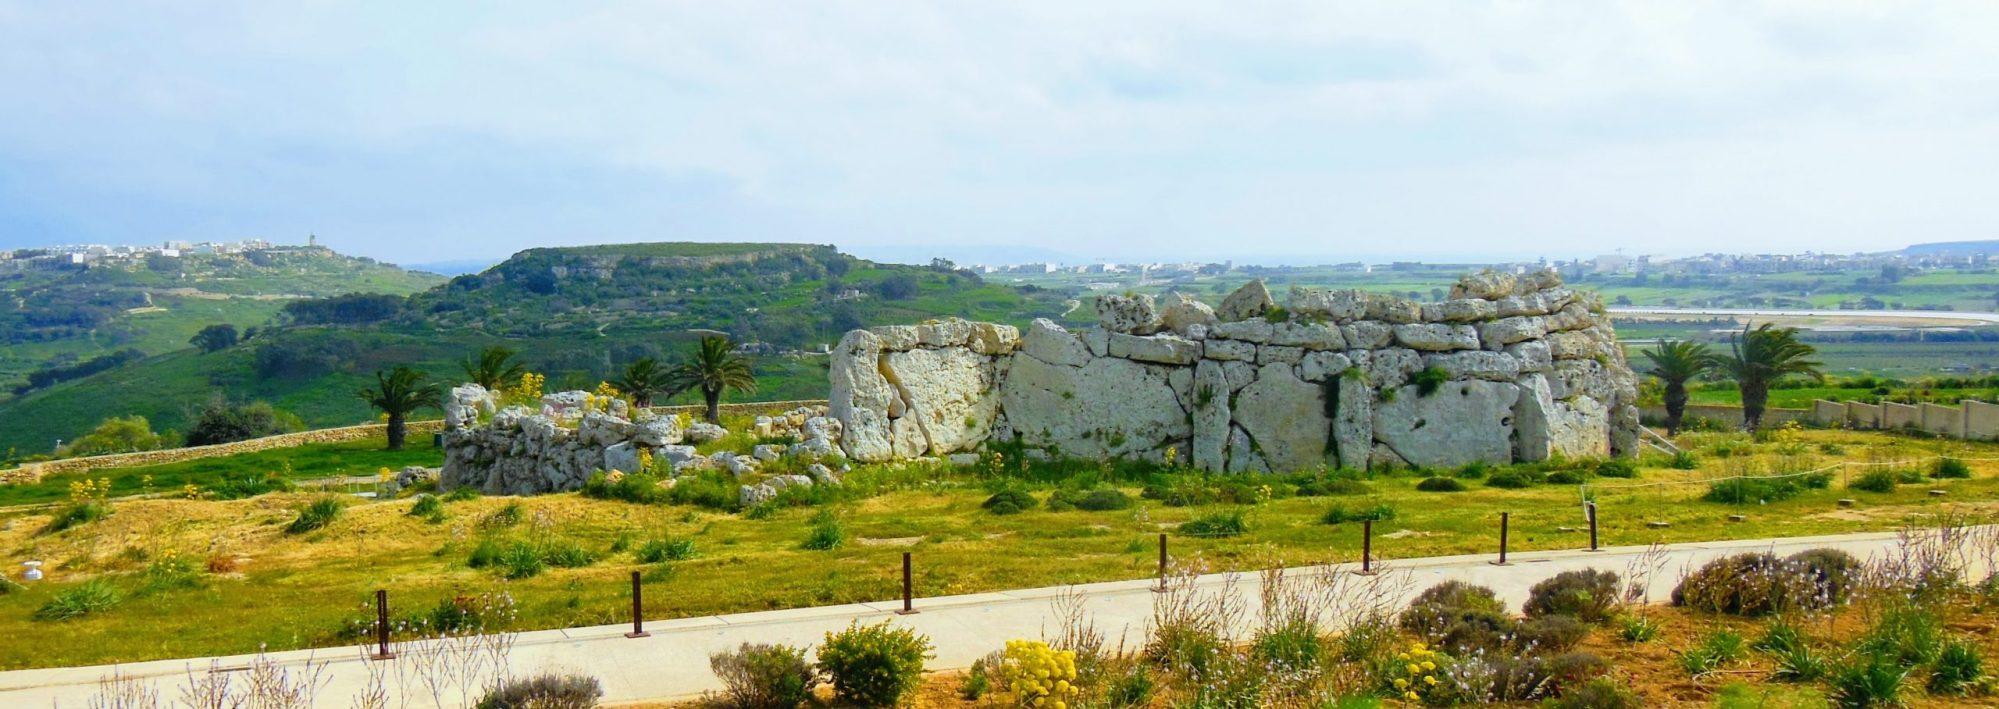 Museo viikonloppu Gozolla banner